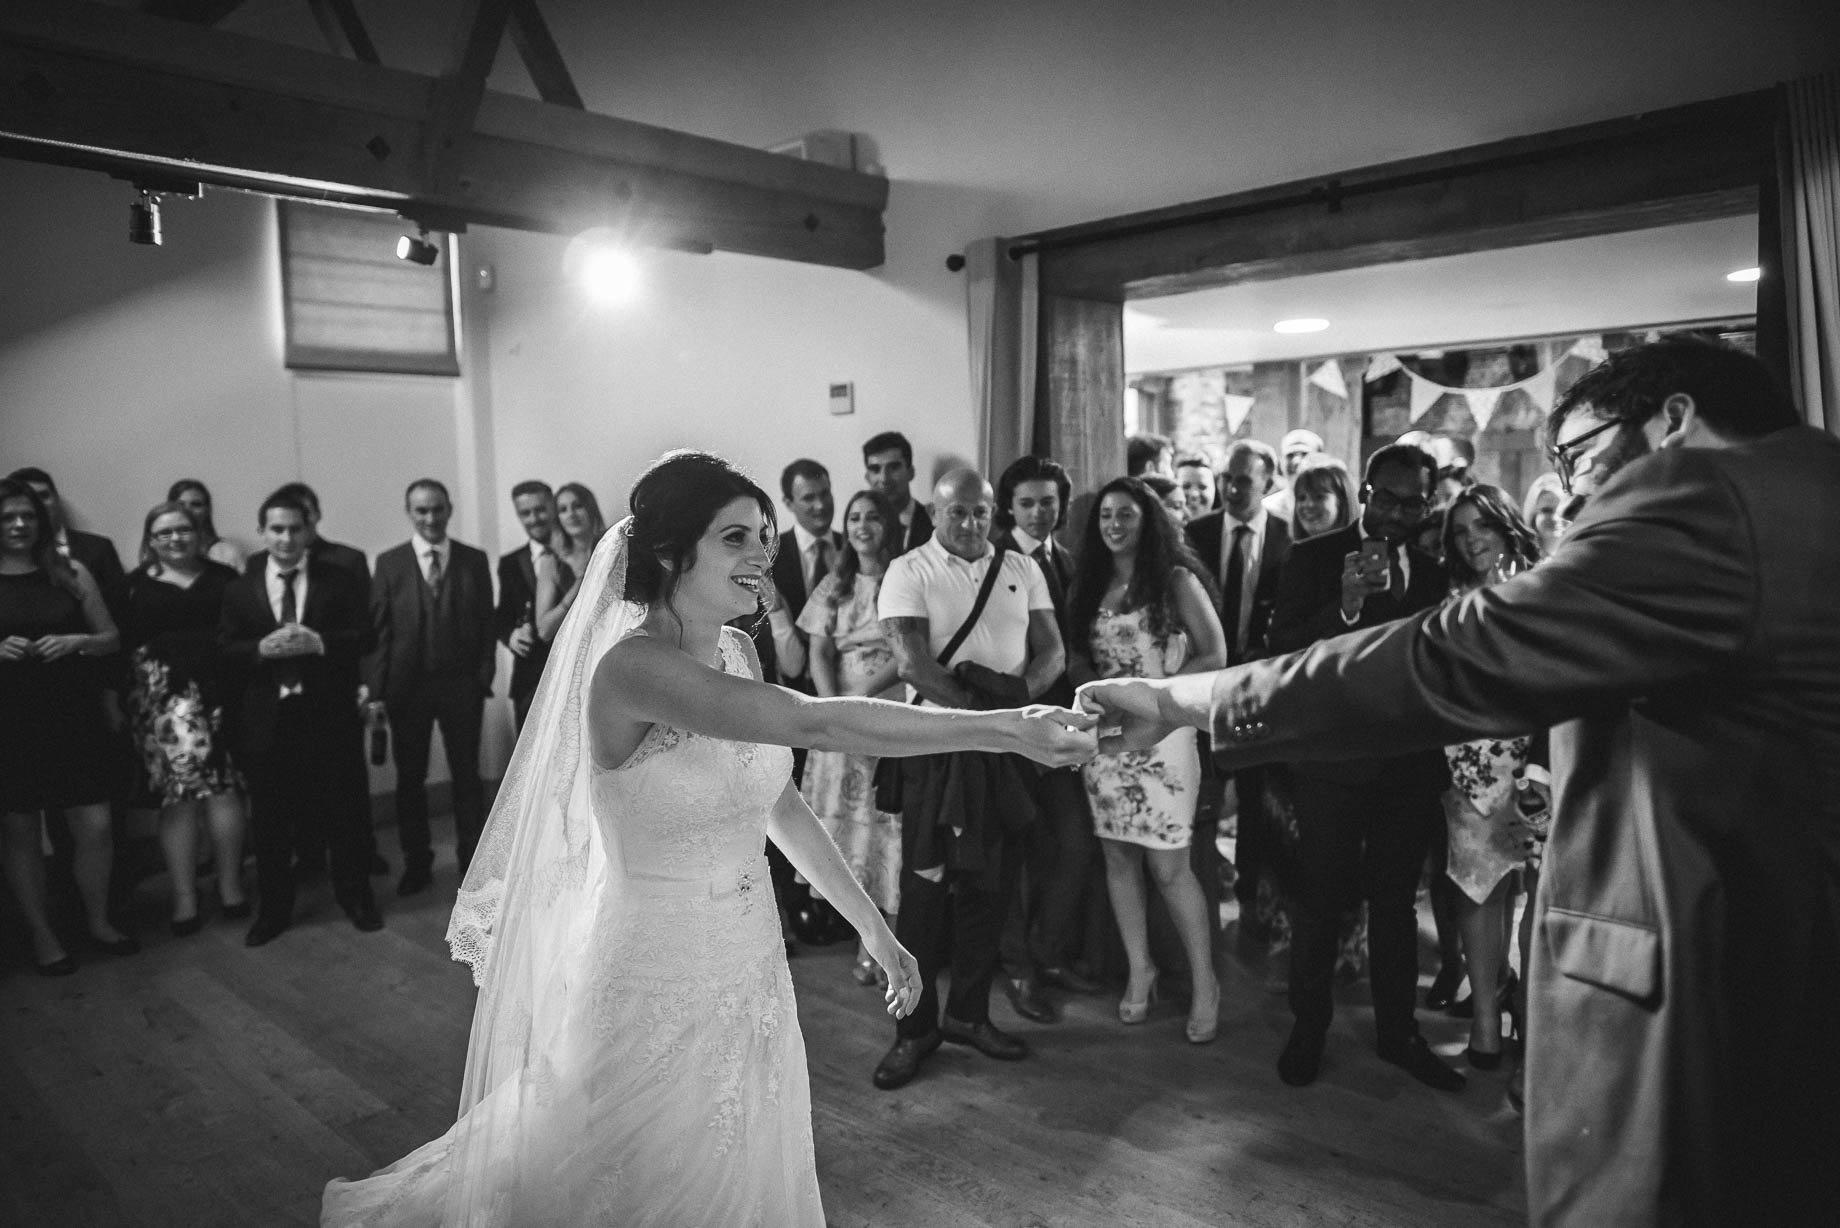 Gaynes Park wedding photography - Guy Collier Photography - Rachel and Jon (161 of 169)